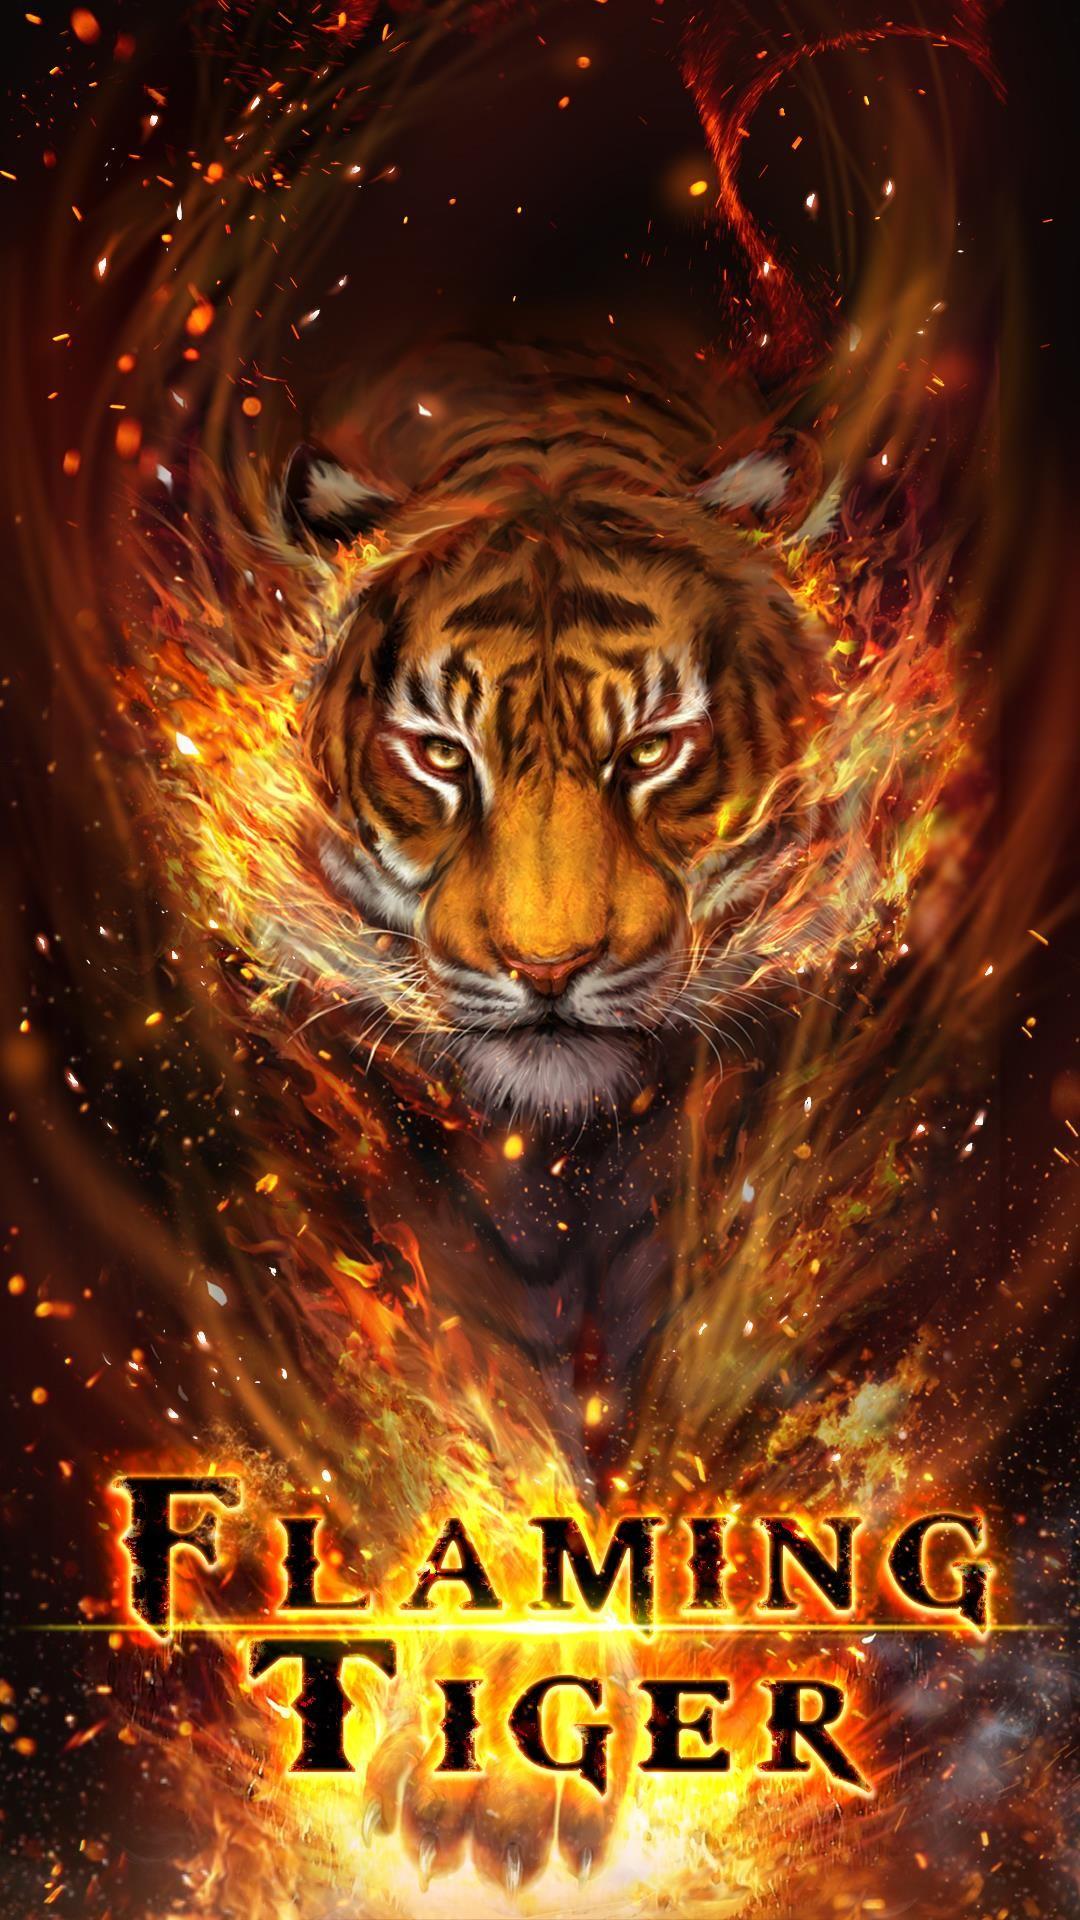 Cool fire tiger, flame tiger, flaming tiger live wallpaper